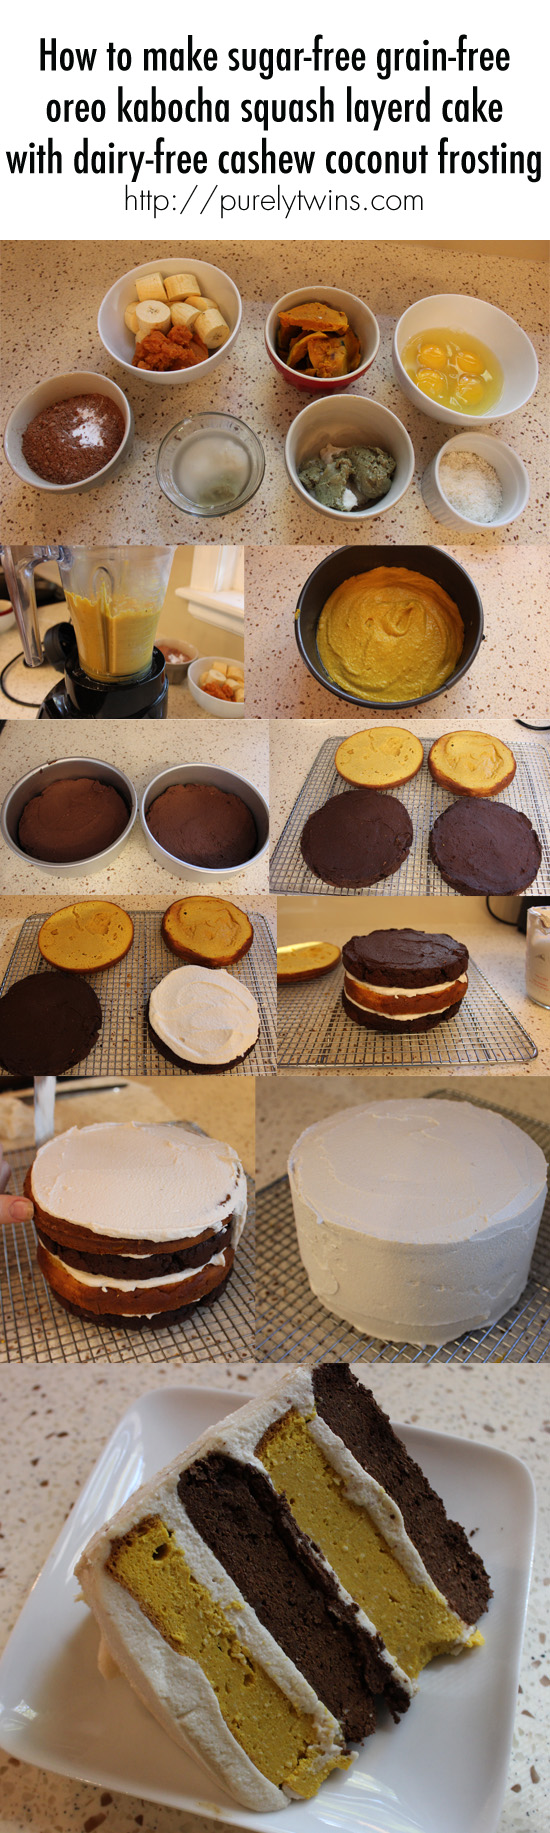 how to make sugar free grain free chocolate oreo kabocha squash layered cake dairy free cashew coconut frosting via @purelytwins